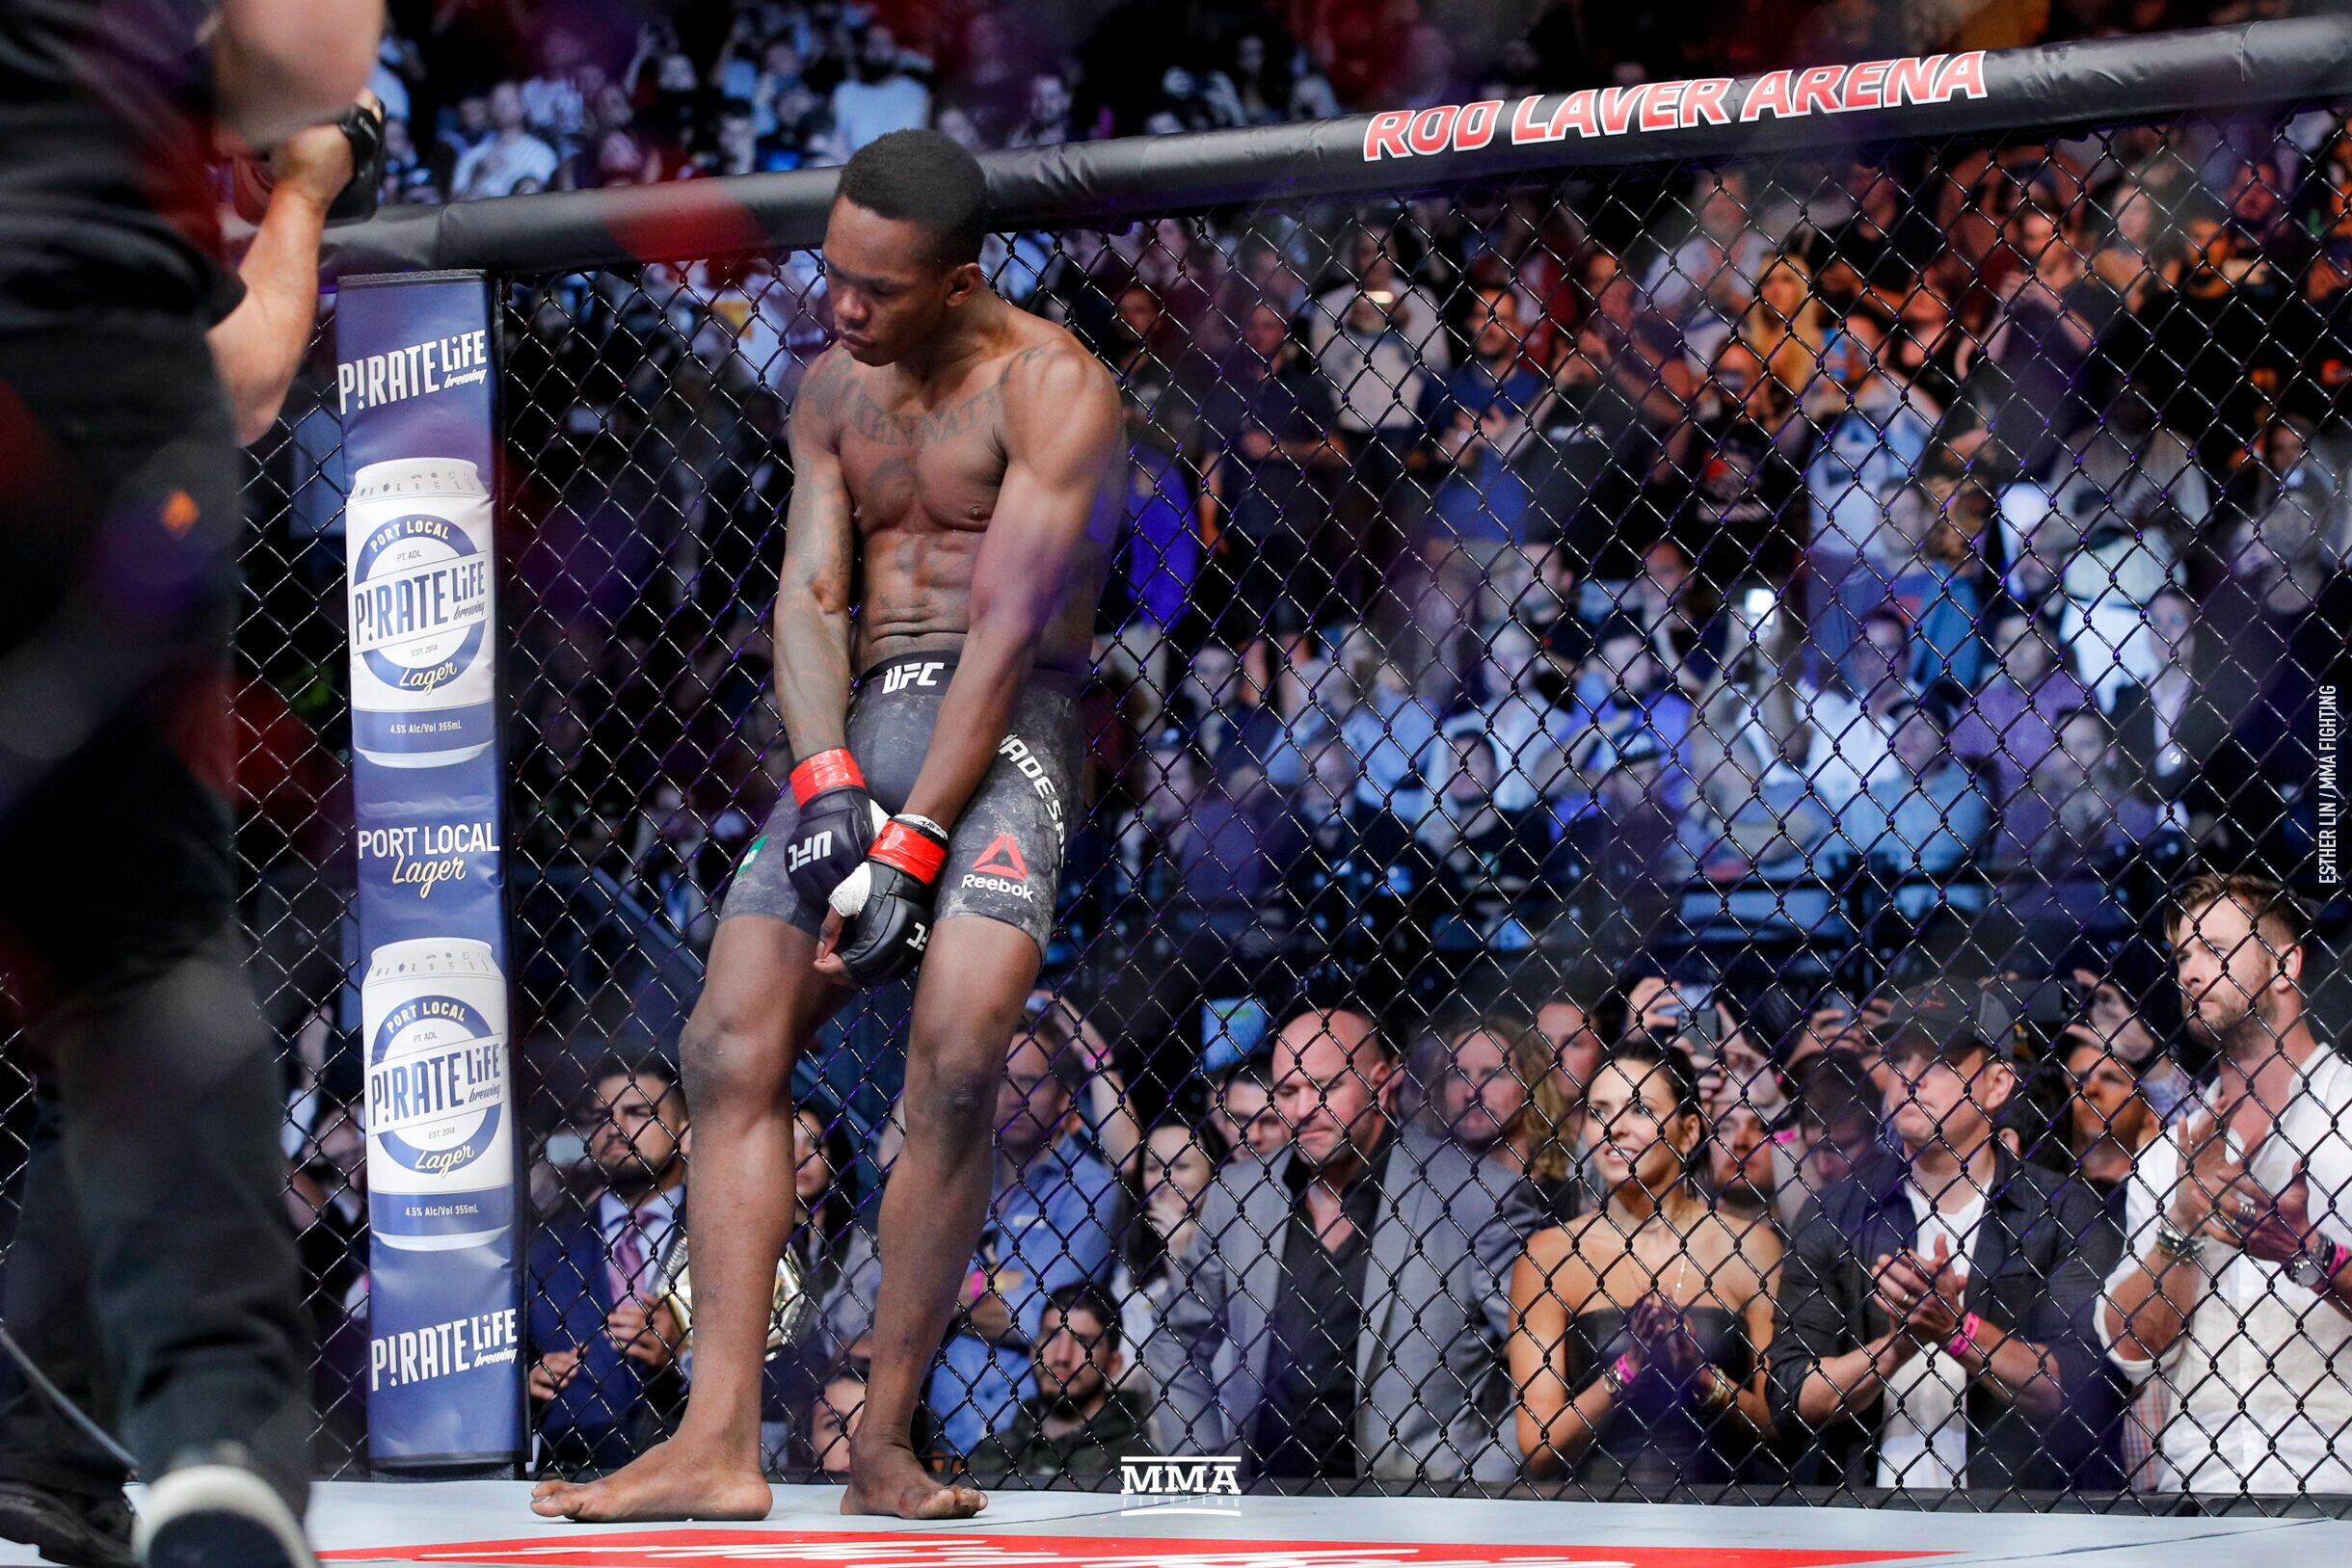 UFC 234 results: Next matches to make for 'Silva vs Adesanya